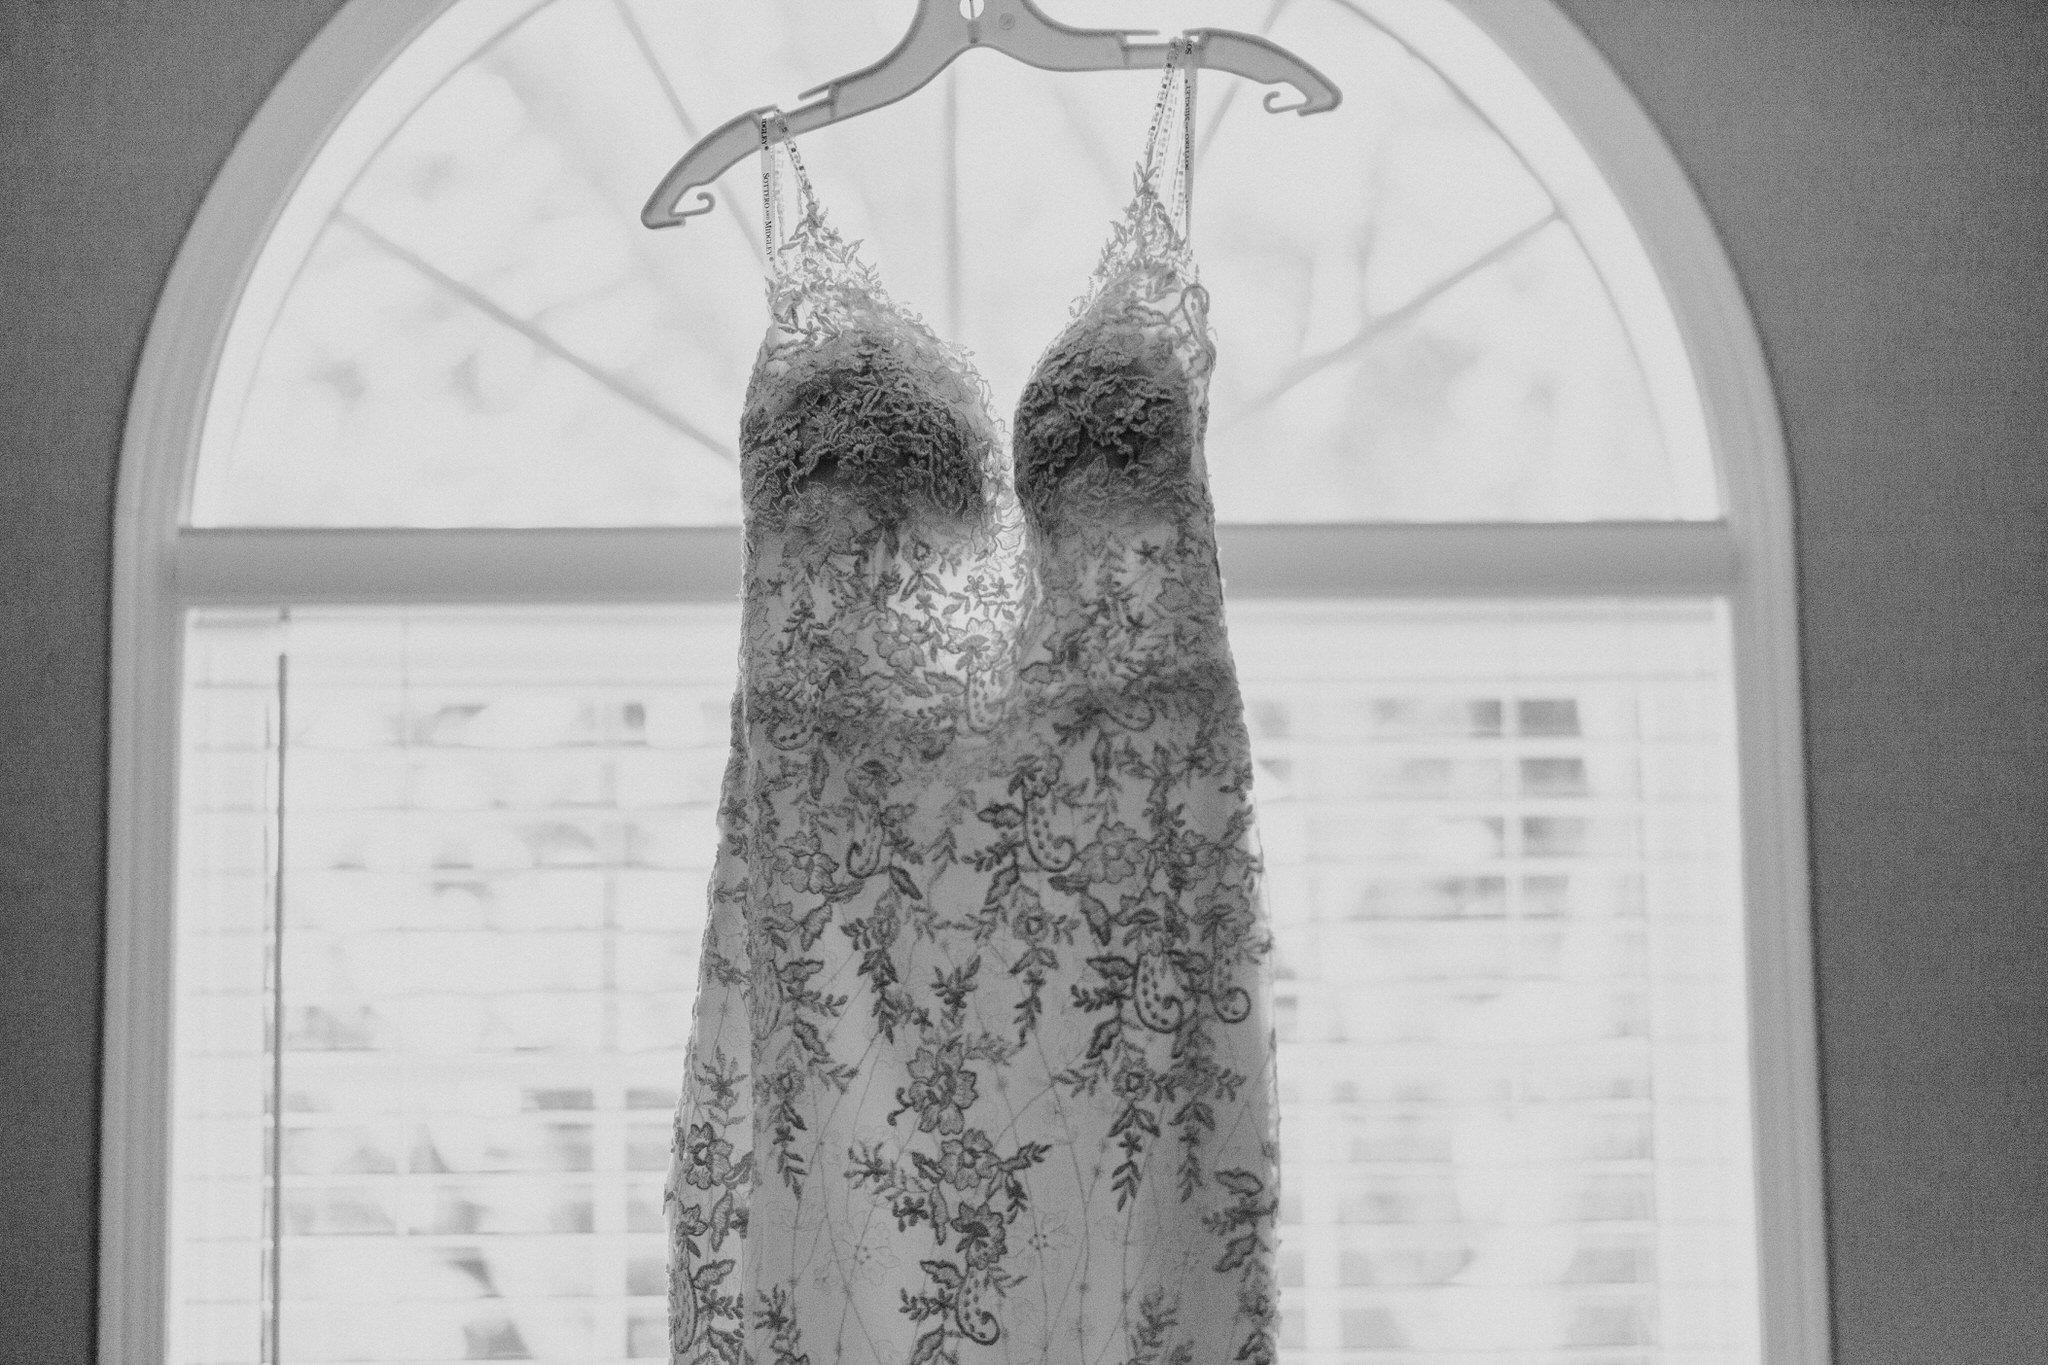 Whitby Wedding Photographer Carol Poitras - - Dress in window